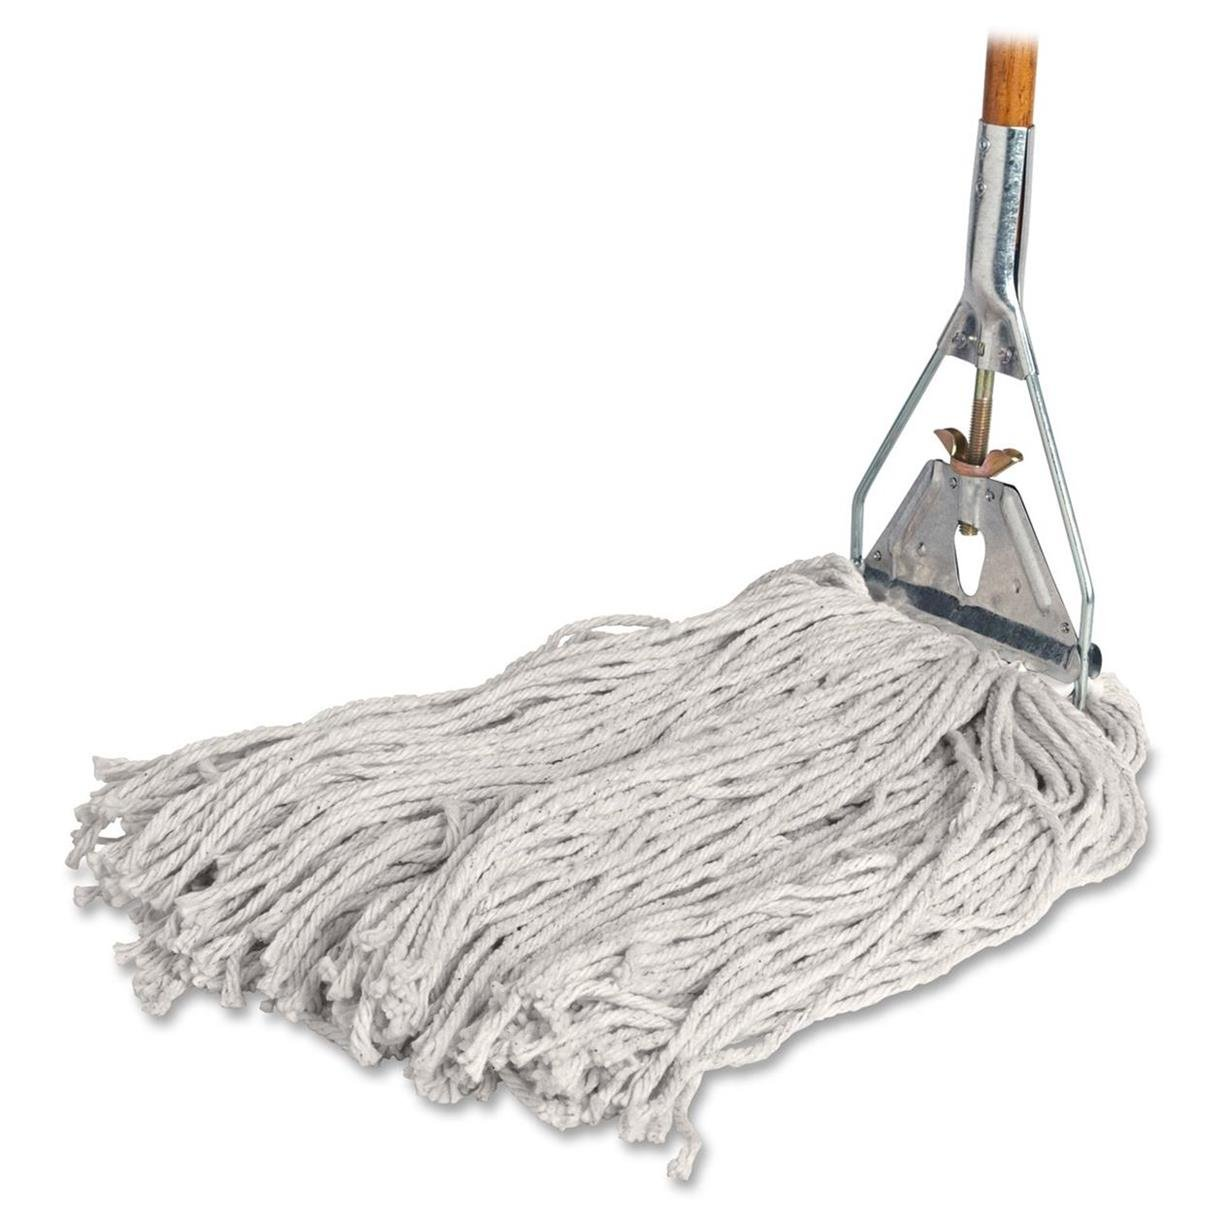 Genuine Joe Cotton Wet Mop with Handle 60'' Width x 0.94'' Height; Cotton HeadWood Handle – Lightweight